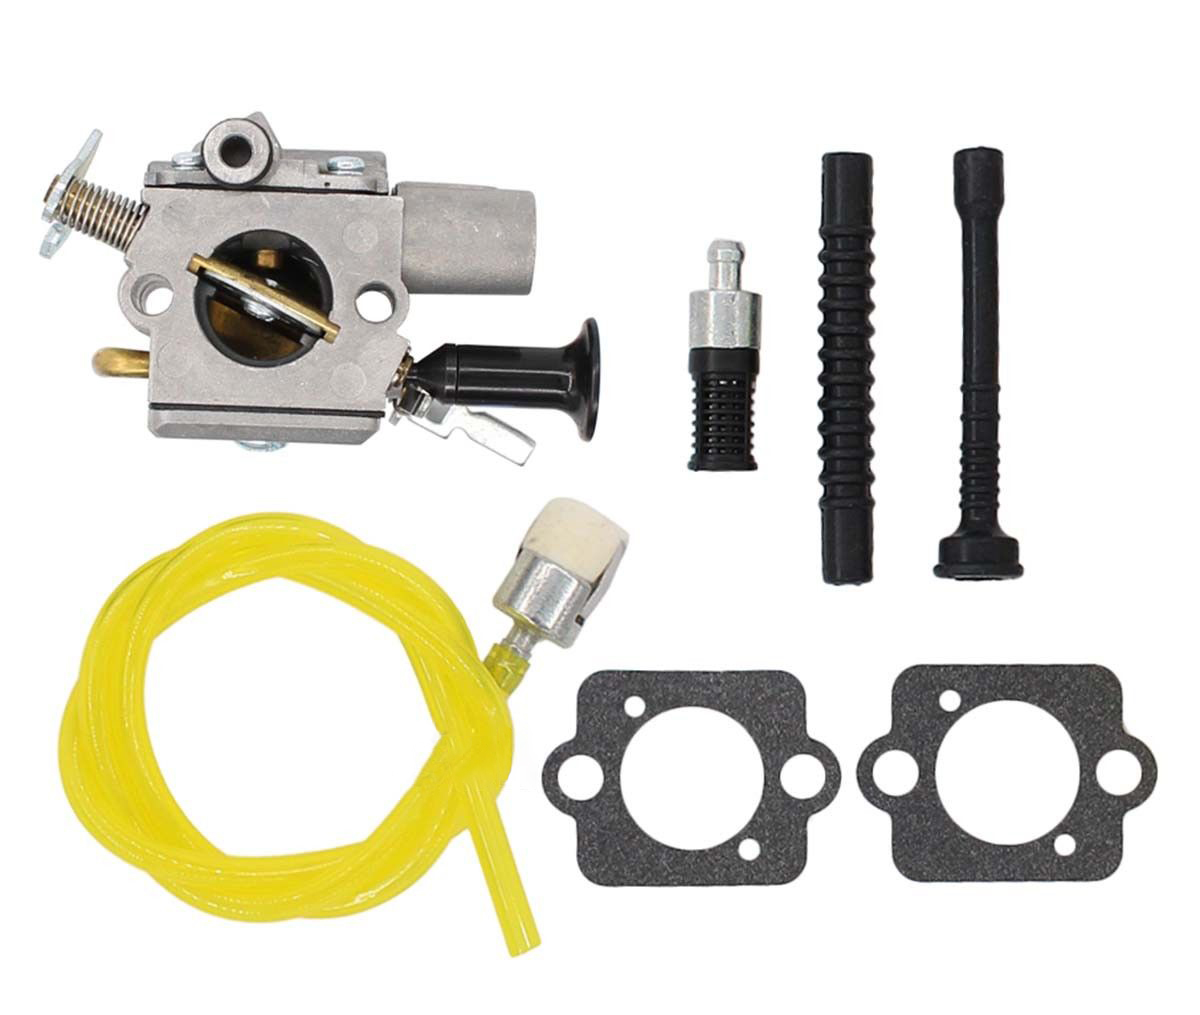 Stihl C1Q 120 Zama 0616 1141 S252 MS271 MS291 For Carb Carburetor New MS261